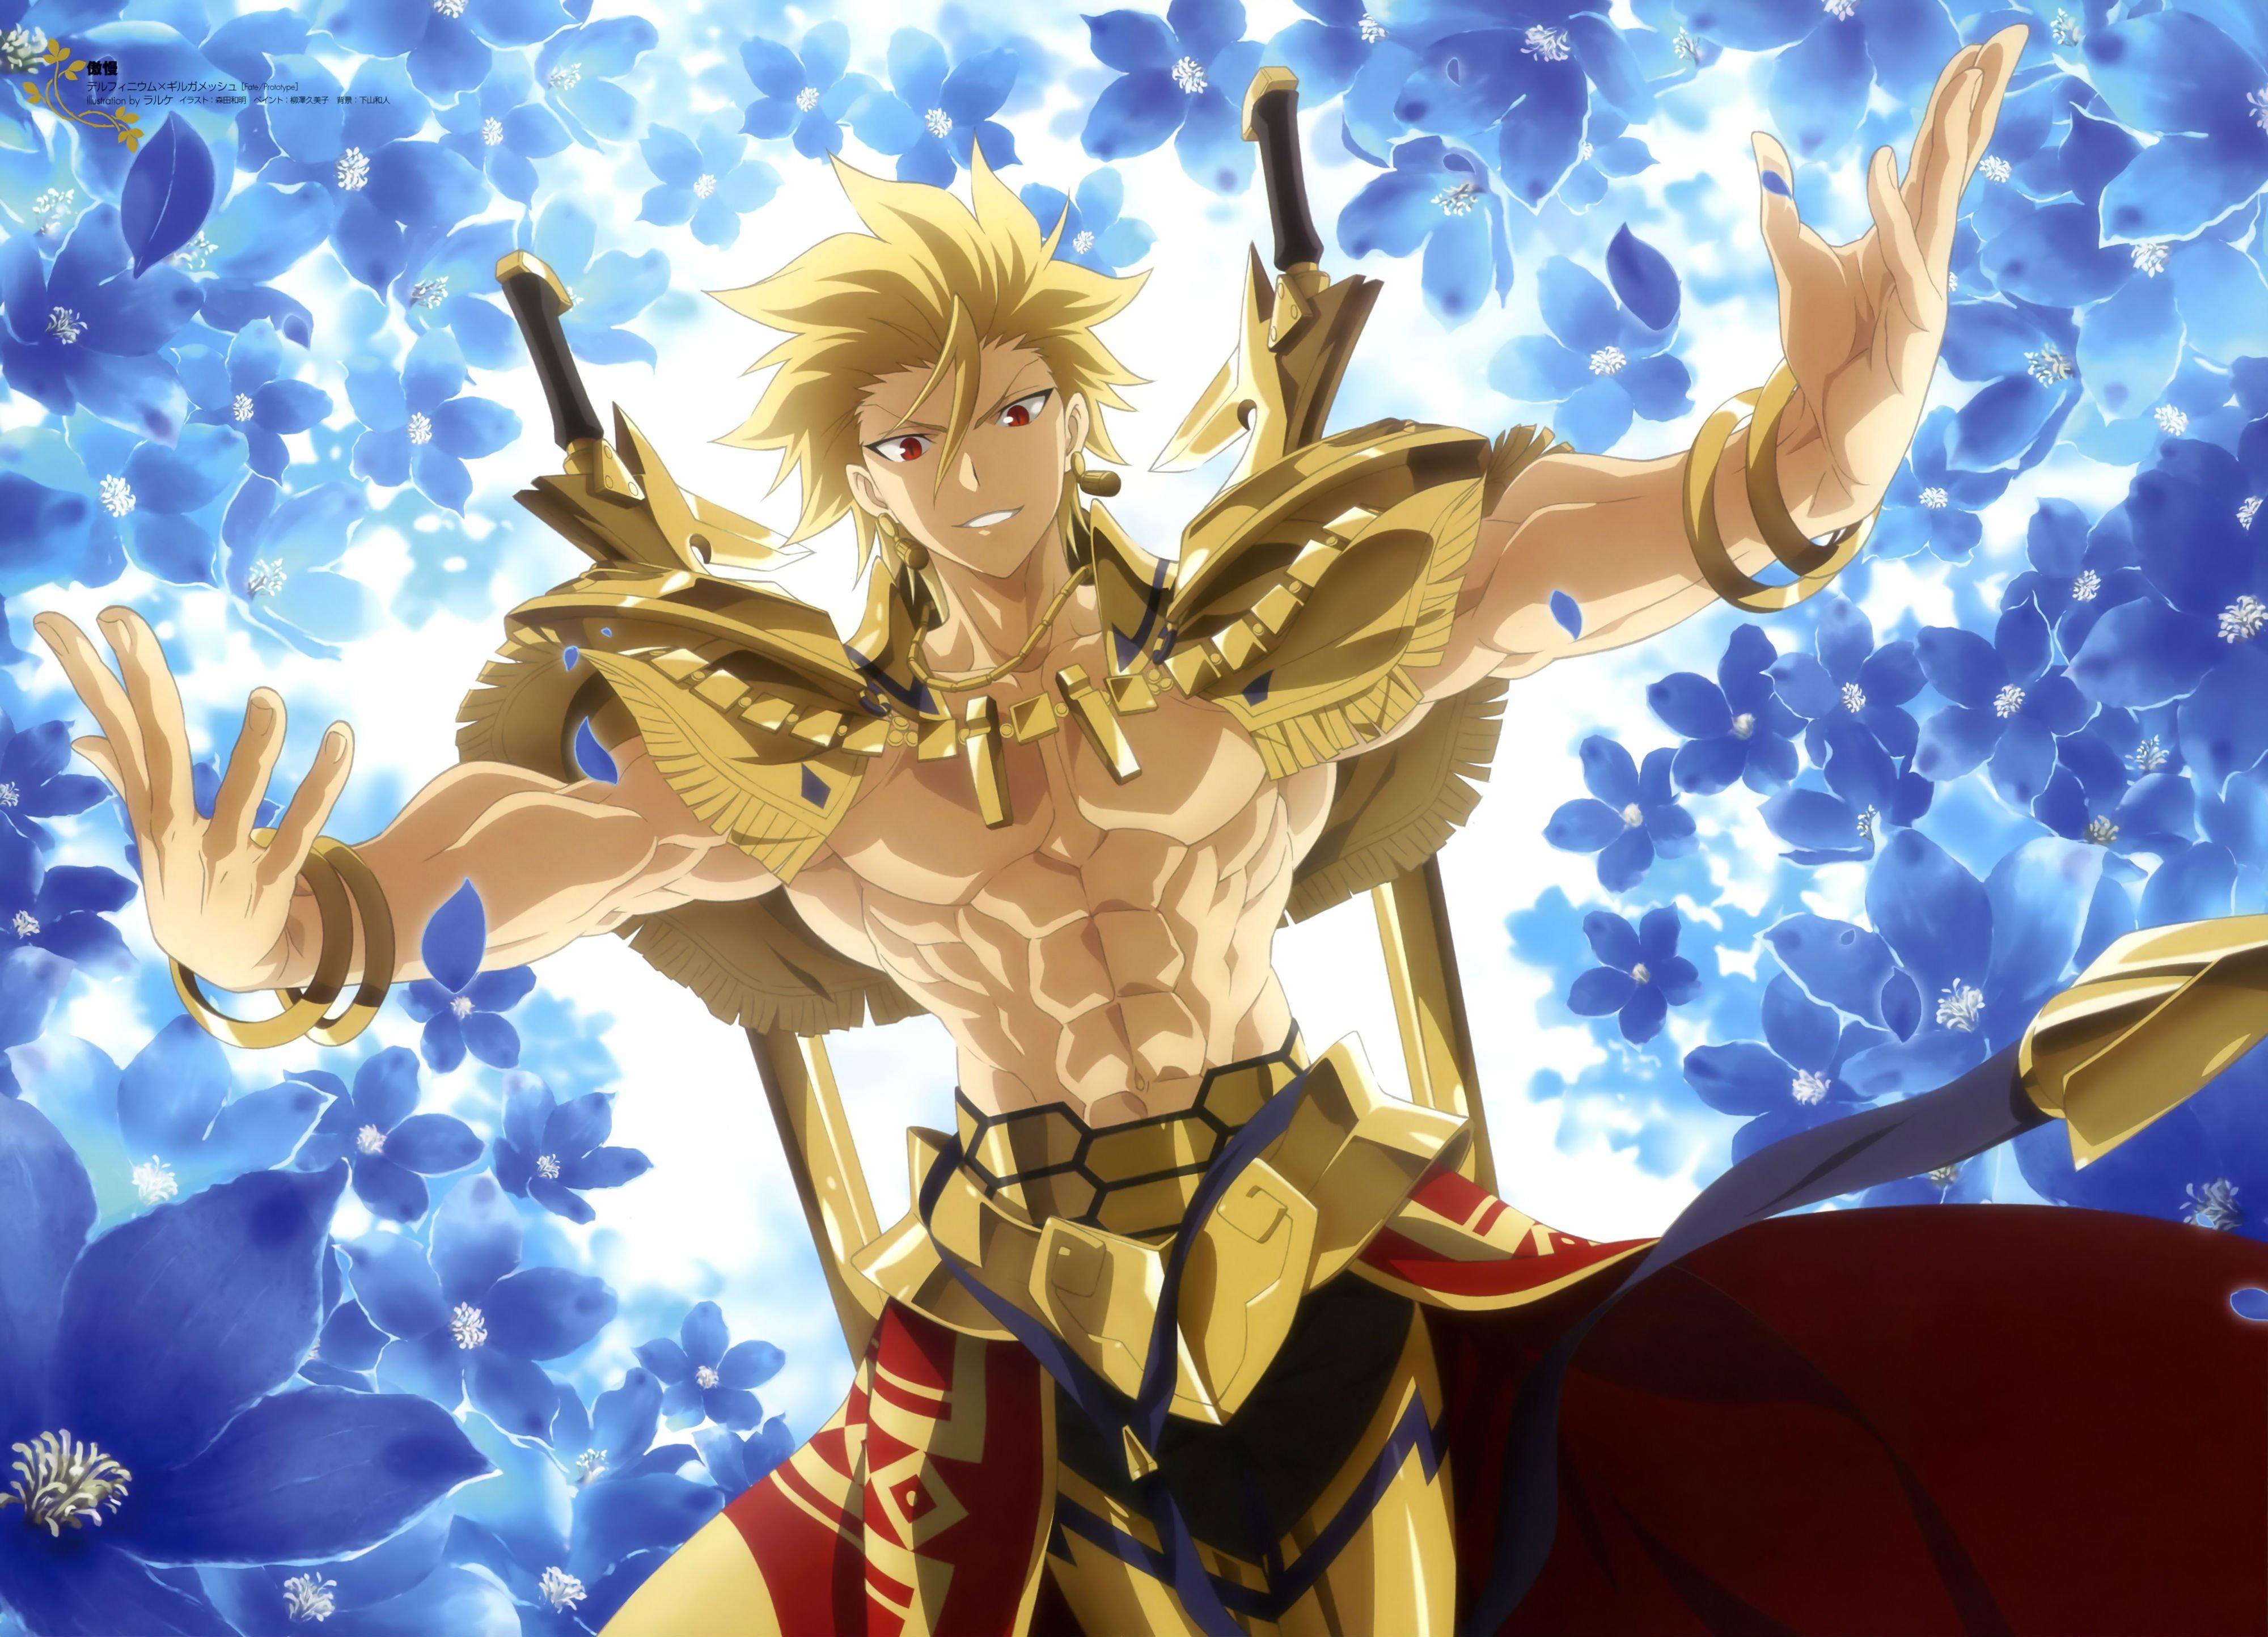 Fate stay night Gilgamesh g wallpaper background 4000x2887